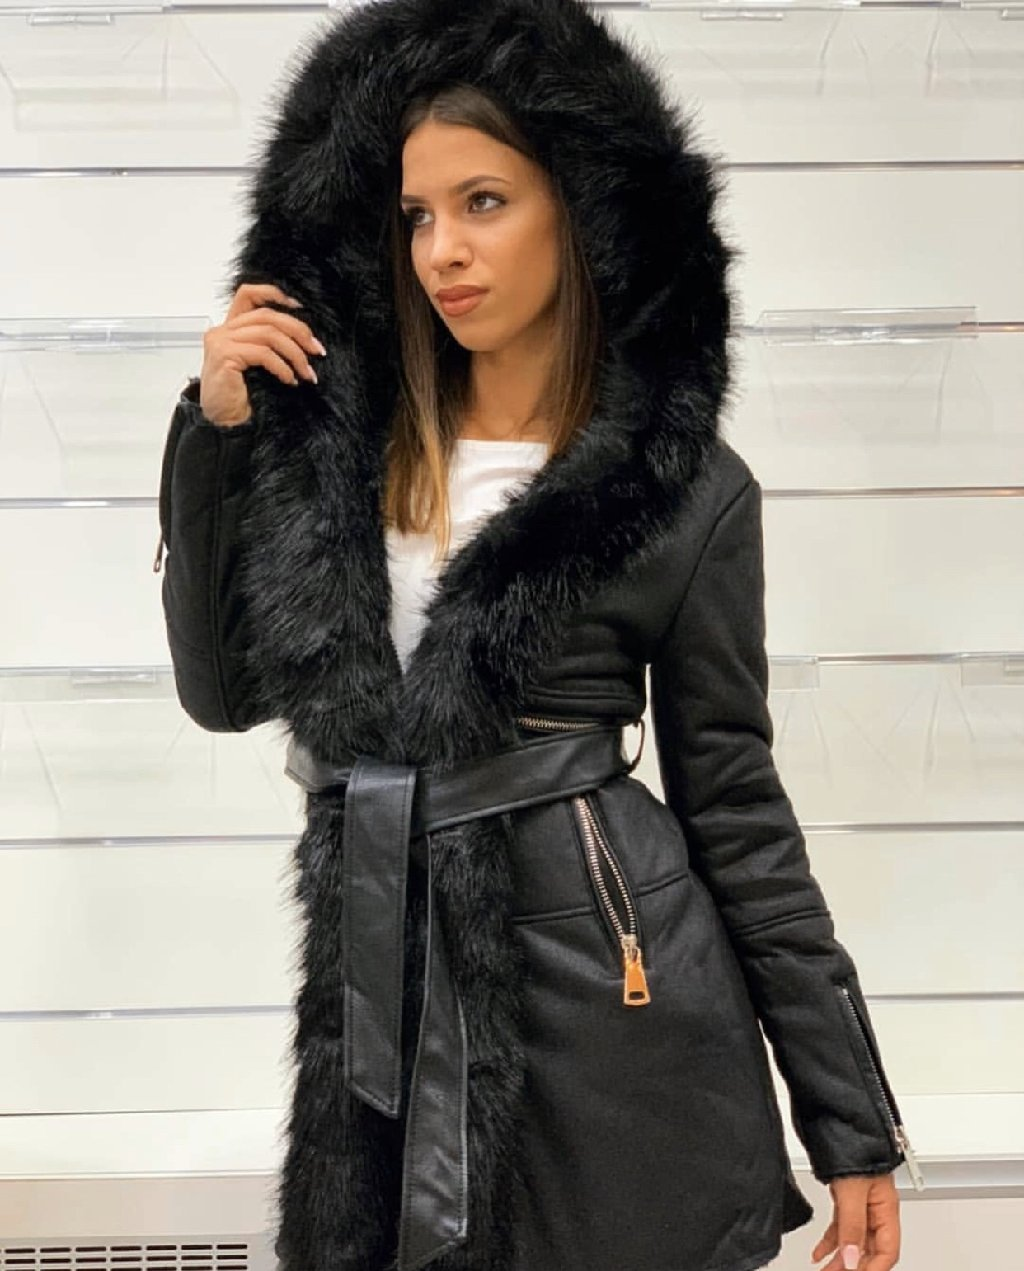 Ženski kaputi - Vrbas: Kaput/ monoton sa krznom, placen 150€, proban samo, isti kao sa slike :) vel XL- do 80 kg odgovara vel